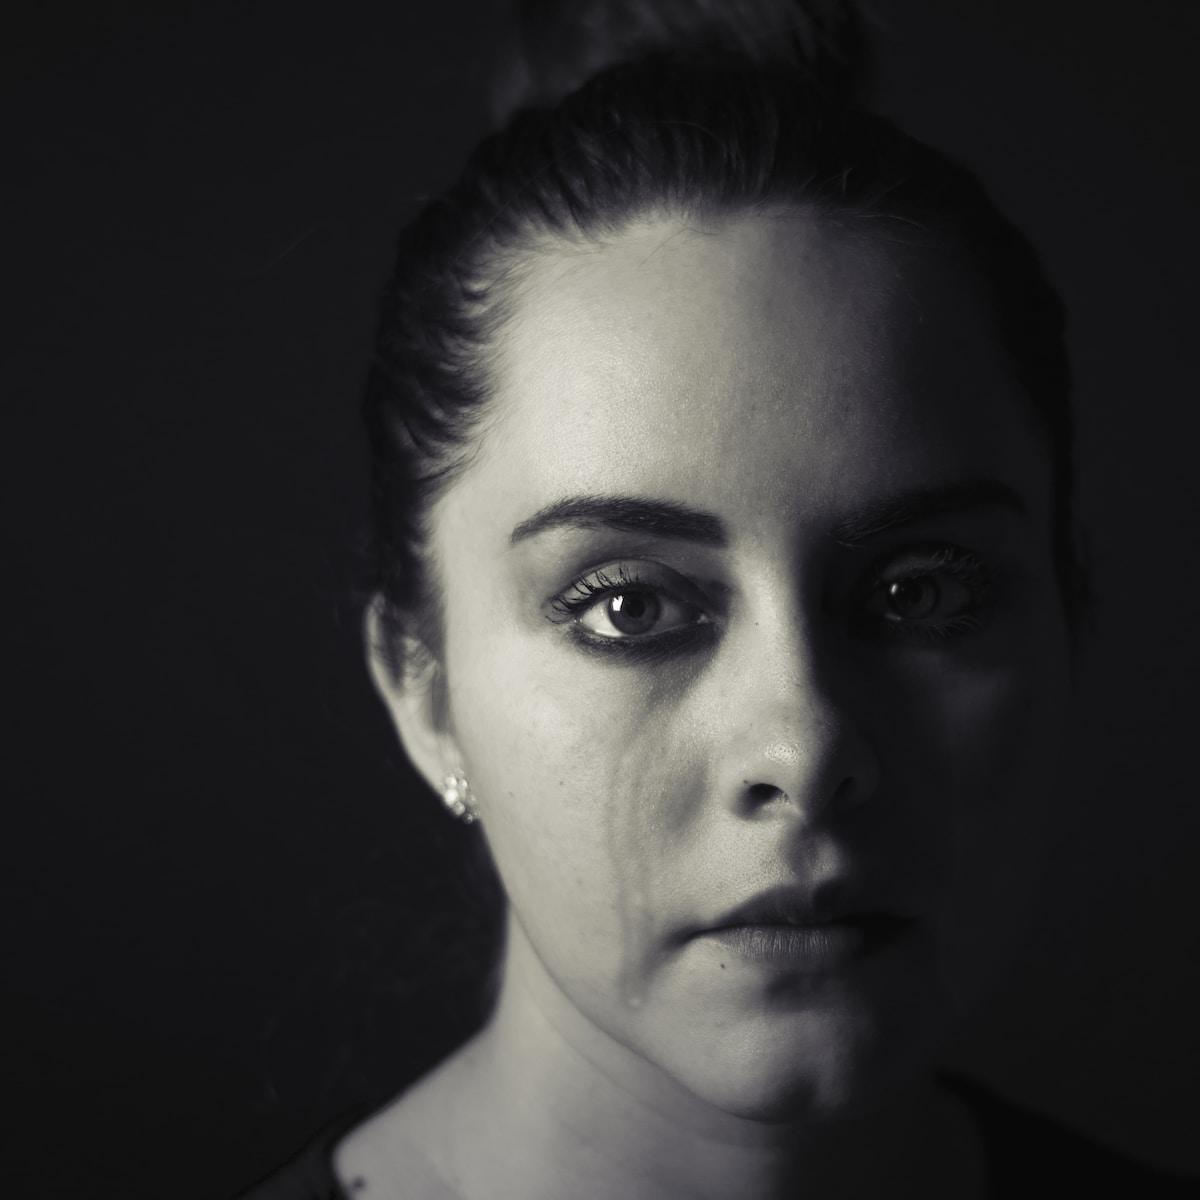 lágrimas negras, woman's face